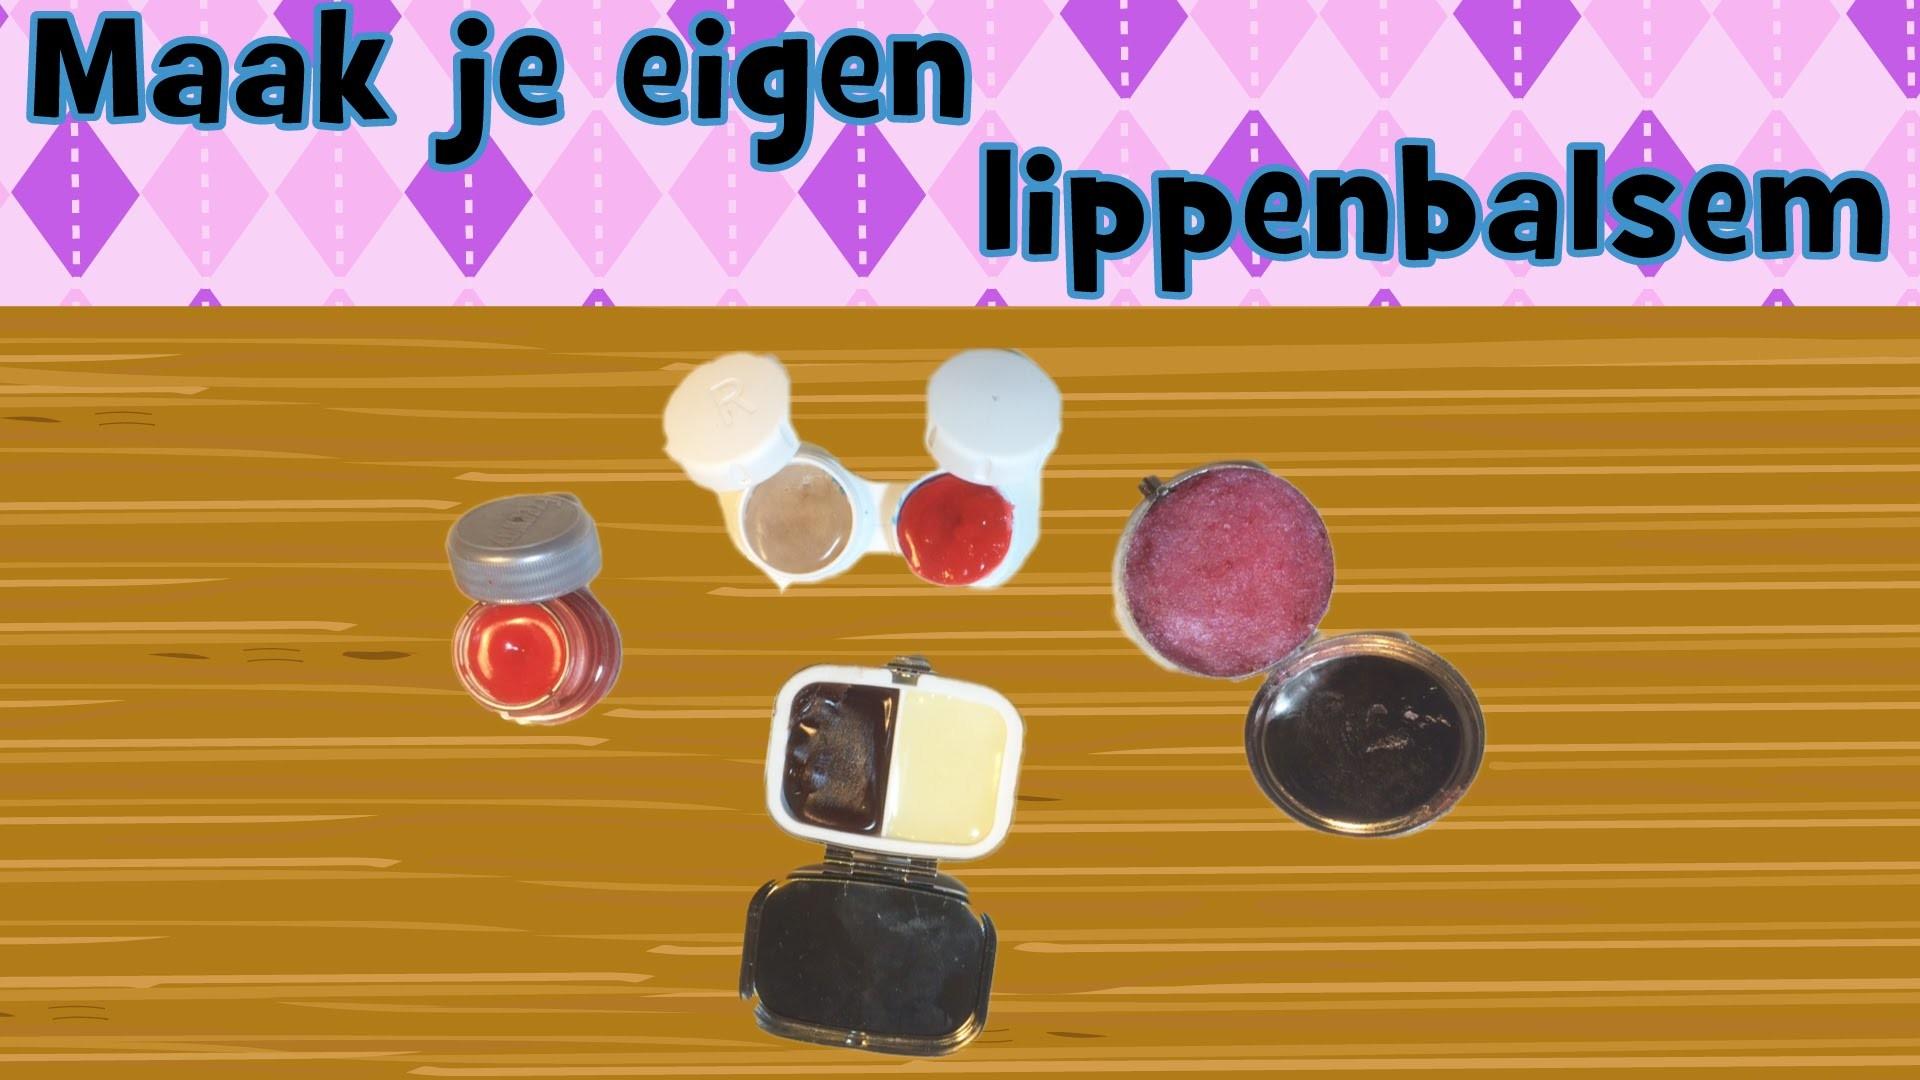 DIY Maak je eigen lippenbalsem. lipgloss van Vaseline en honing